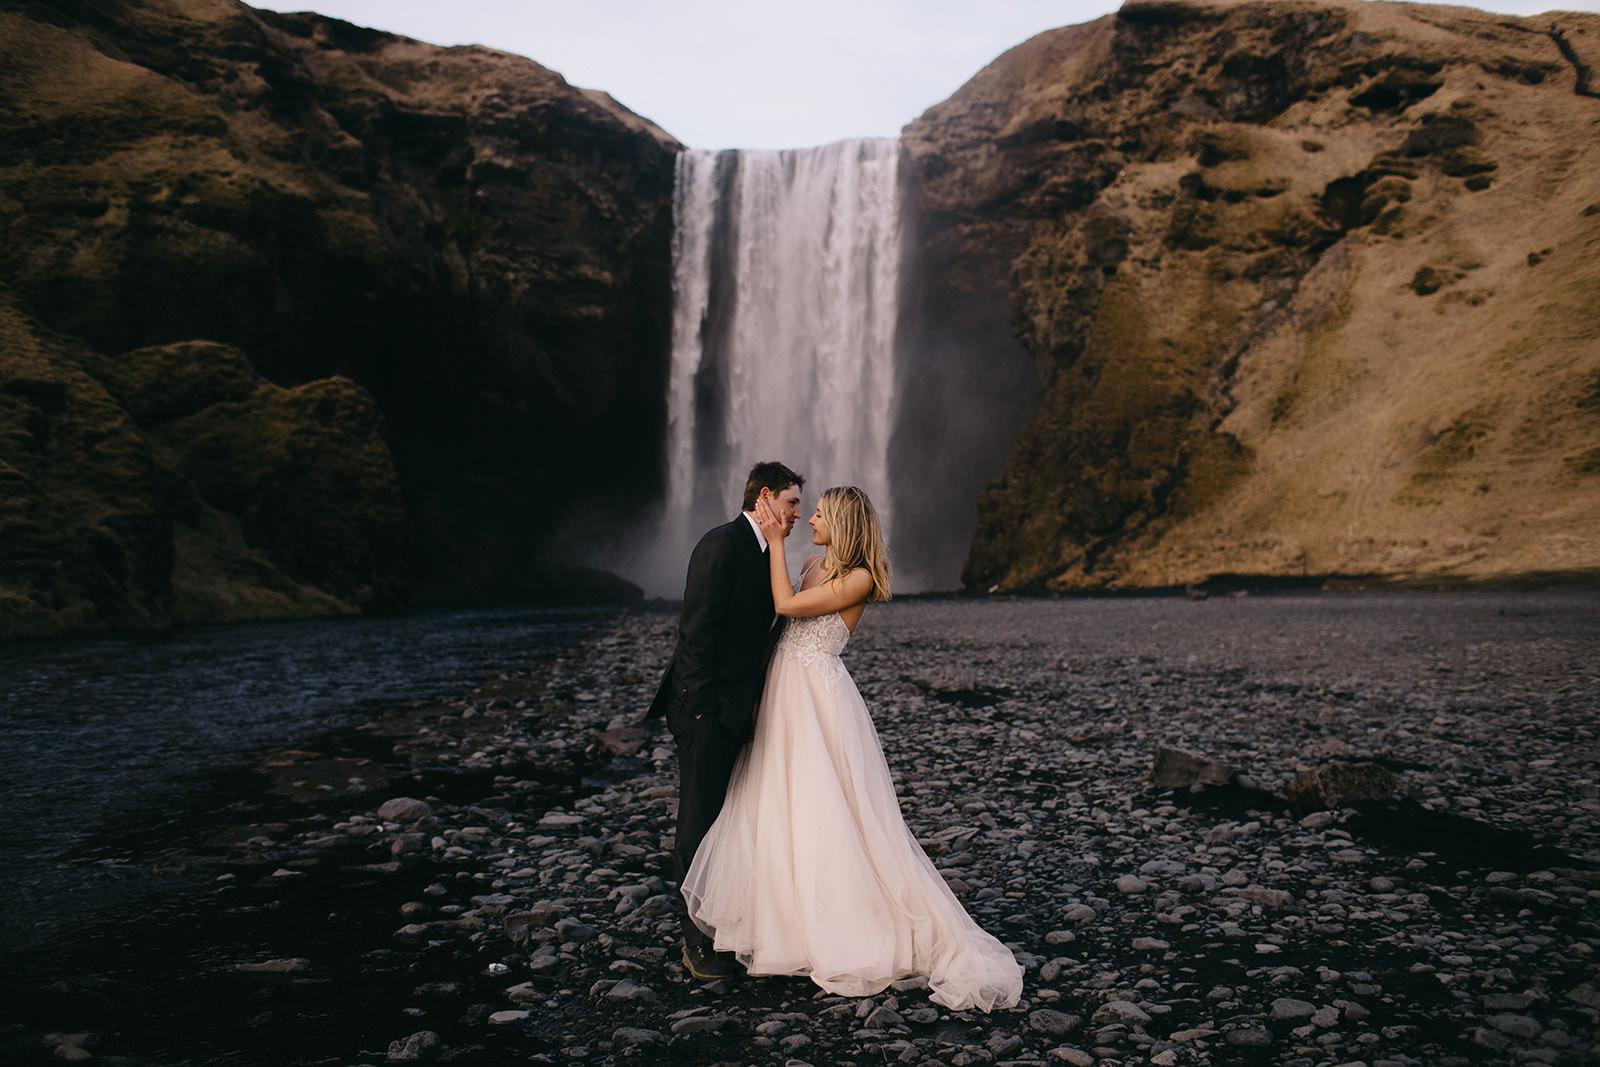 Icelandic Iceland Elopement Wedding Elope Photographer Eloping Reykjavík Vik Black Sand Beach Jökulsárlón Skogafoss Waterfall Vestrahorn Mountain Liz Osban Photography Destination 111.jpg